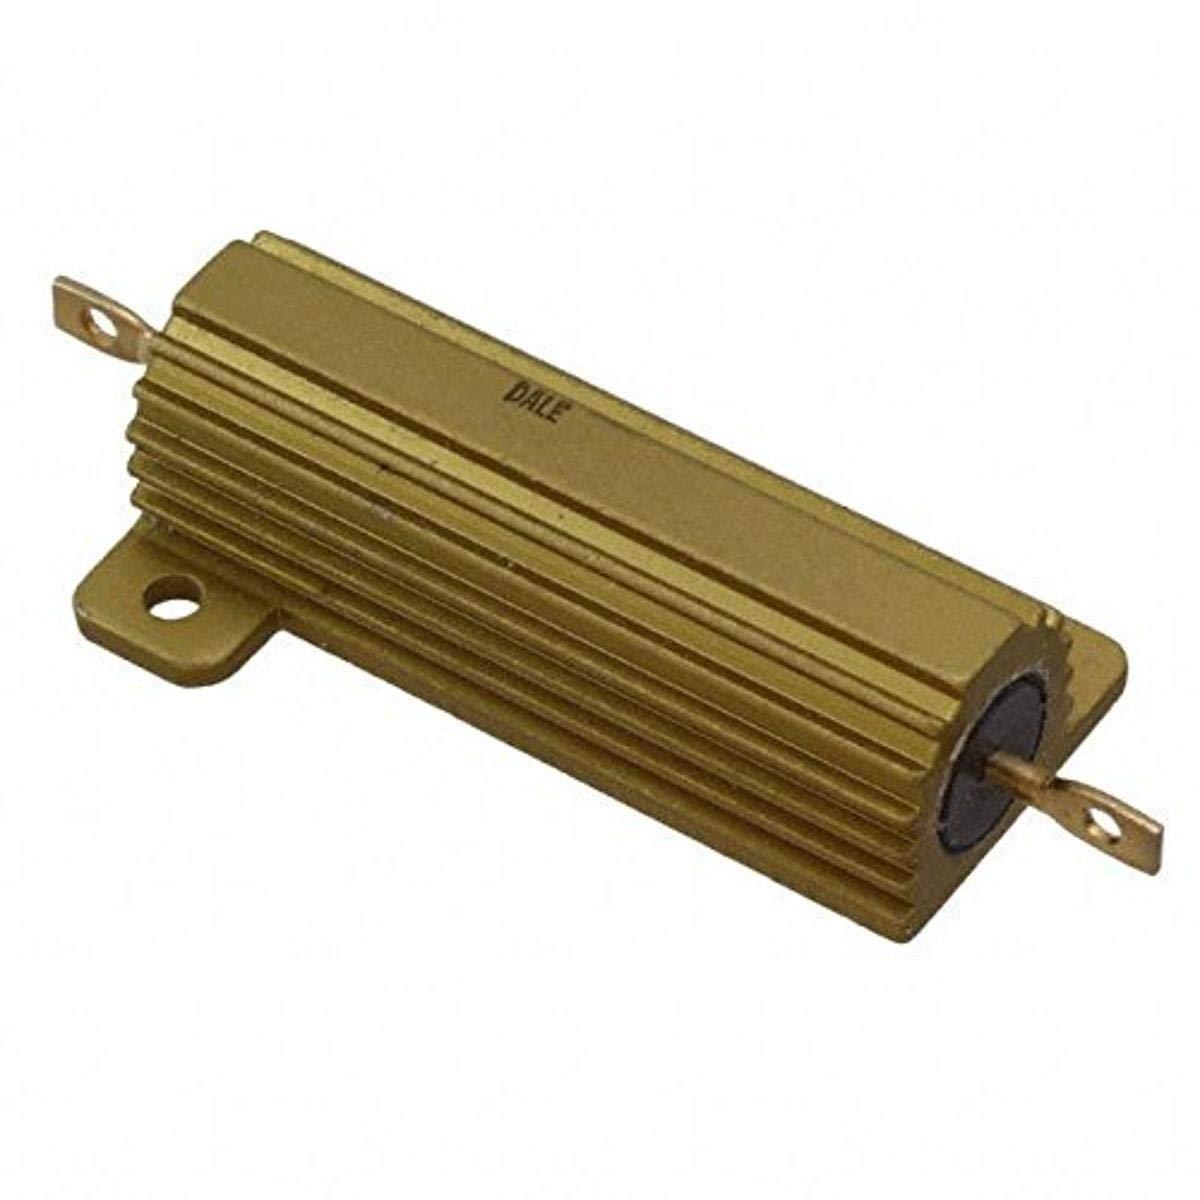 Vishay-Dale RH0508R000FE02 Wire wound Resistor, 8 Ohm, 50 Watt, 1% Tolerance, Pack of 1